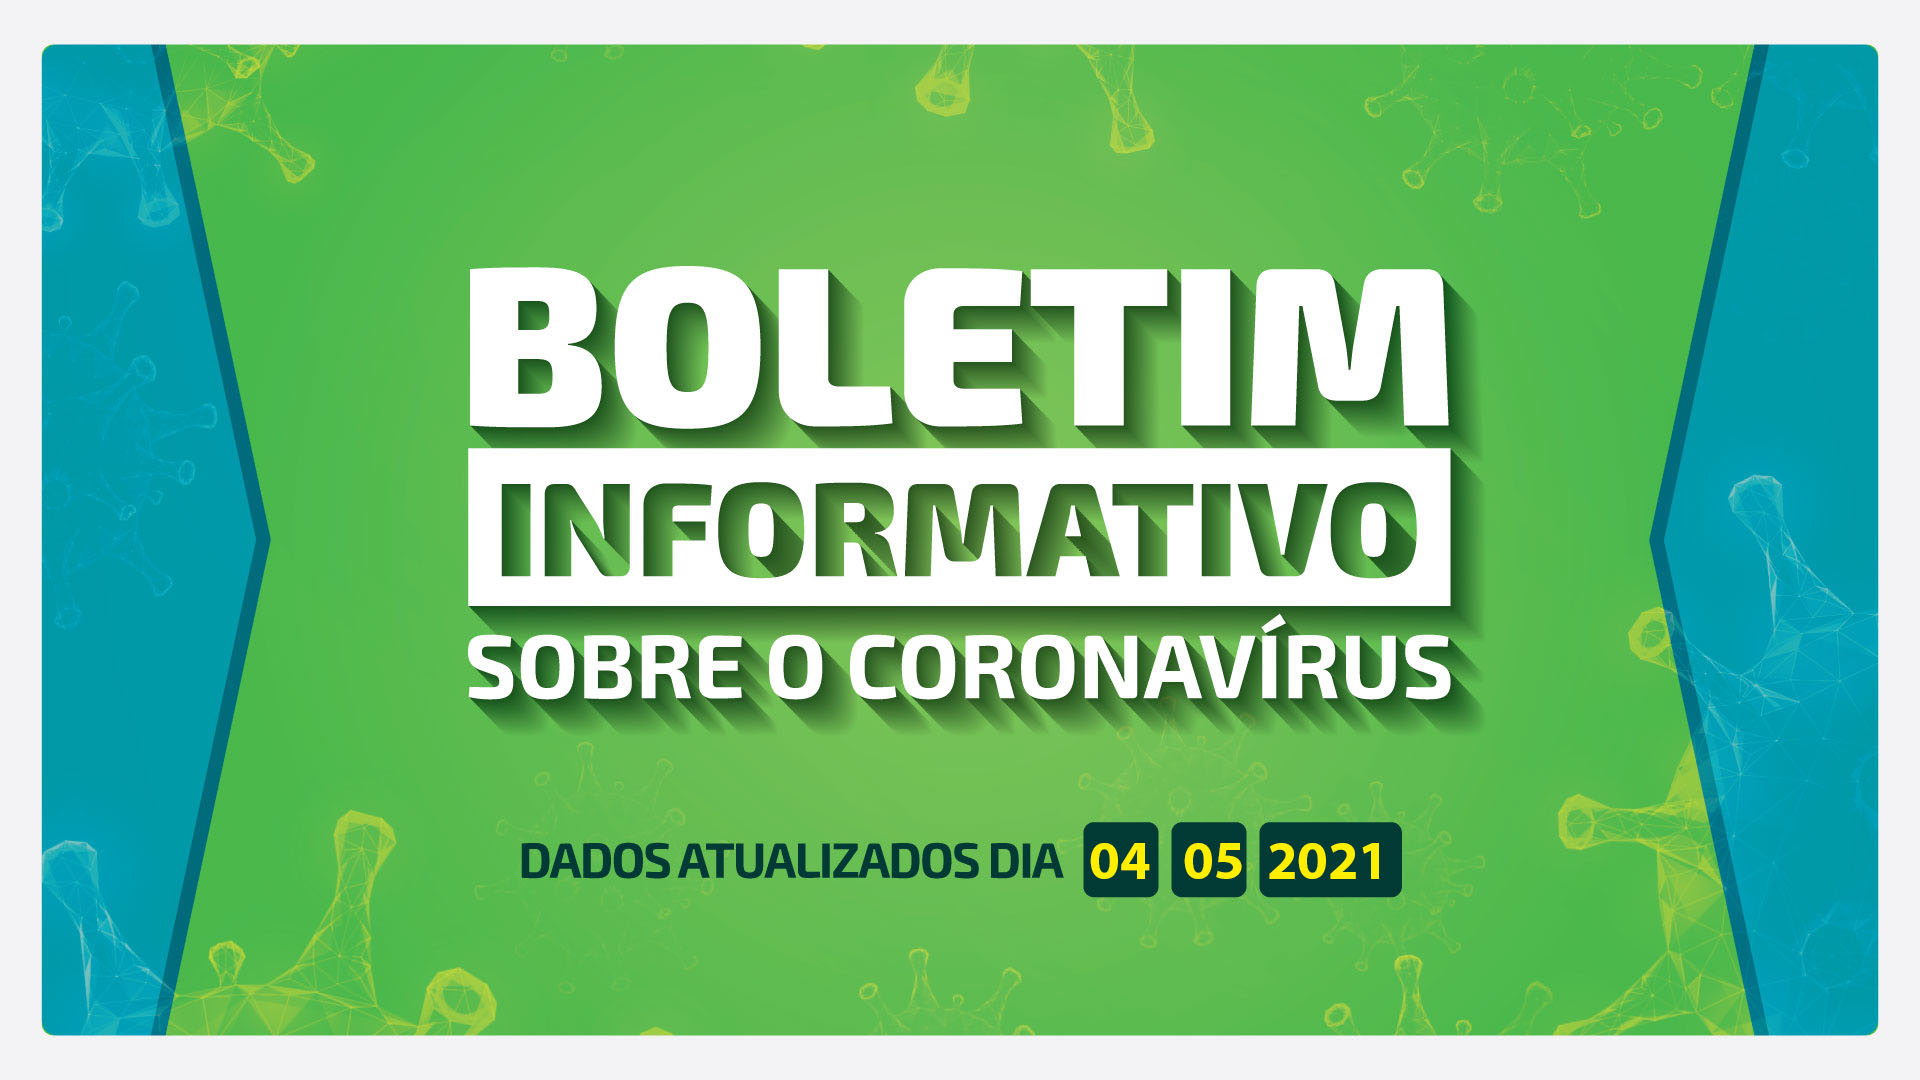 BOLETIM DIÁRIO CORONAVÍRUS - 04/05/2021